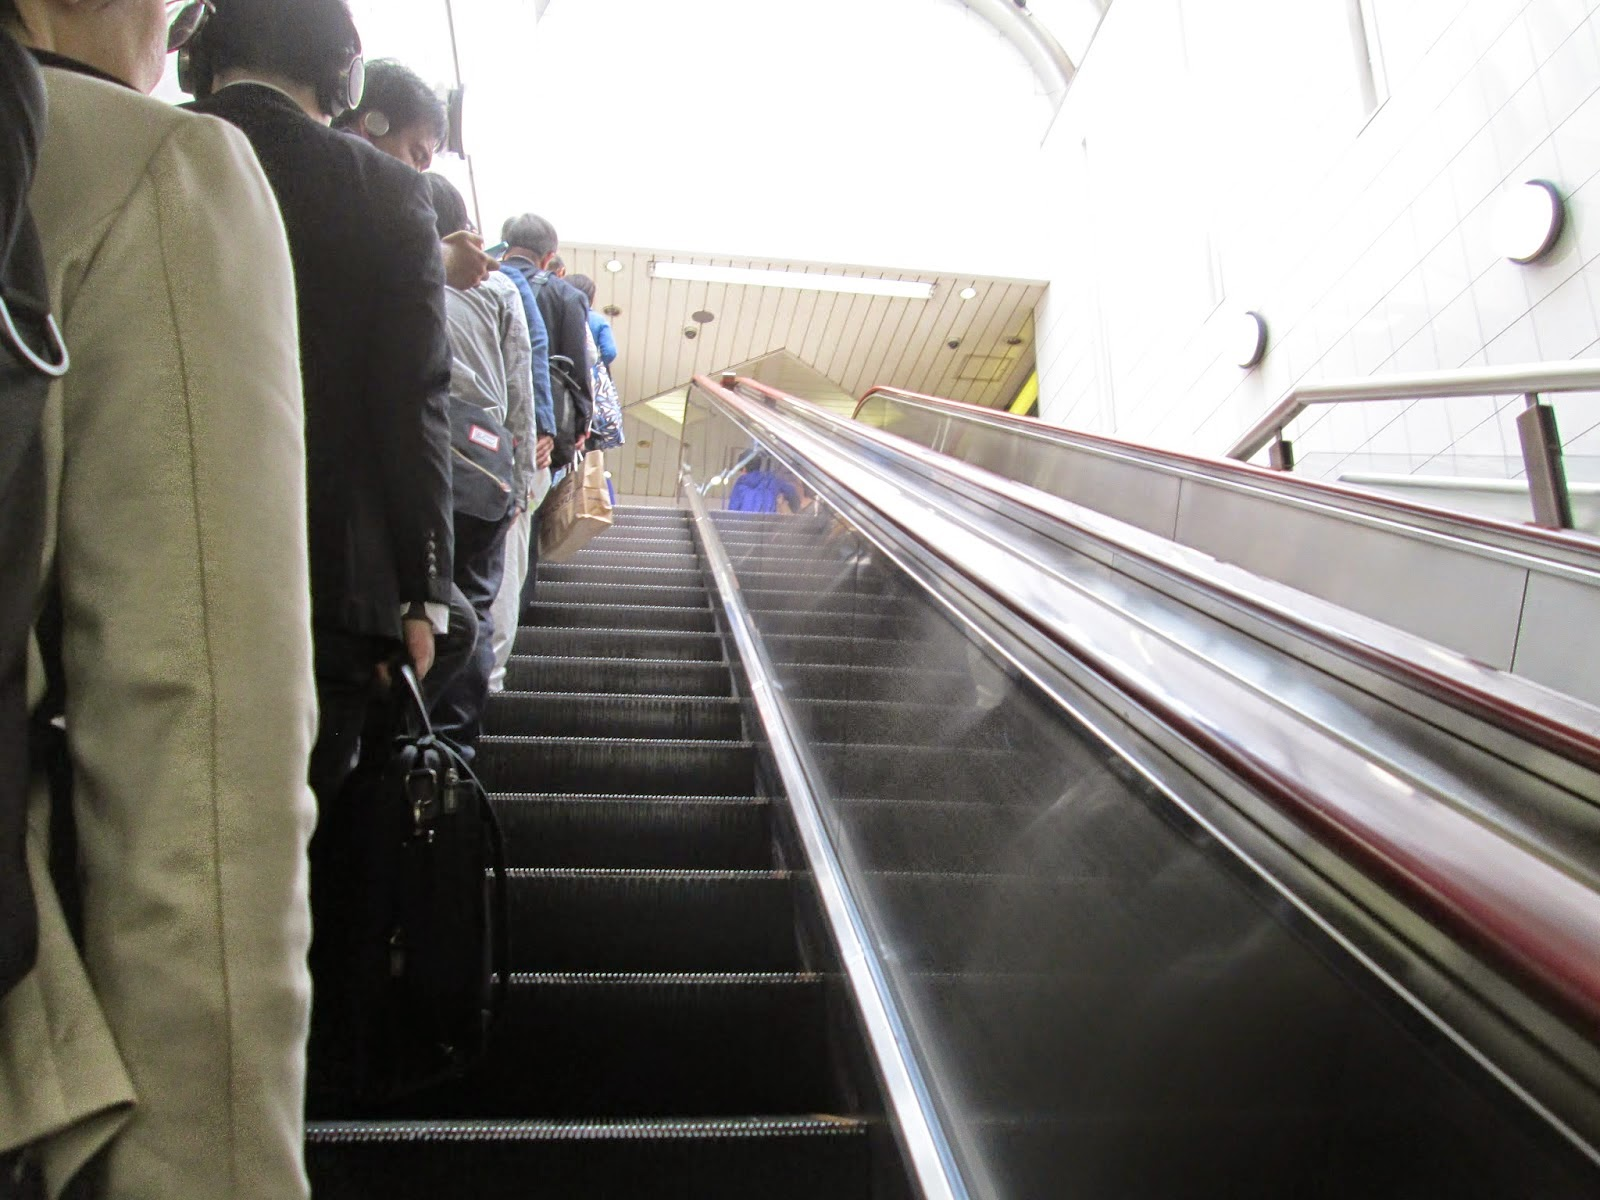 Kenali Kebiasaan Orang Jepang, Agar Wisatawan Cepat Beradaptasi